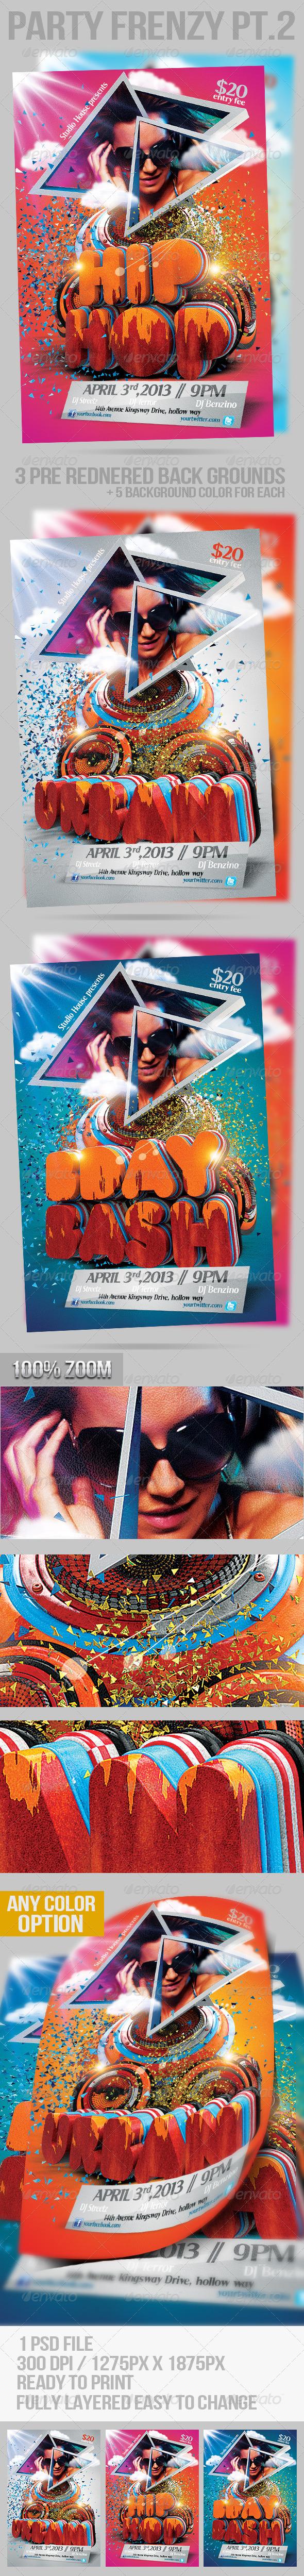 Birthday Bash Party Frenzy flyers Pt. 2 - Flyers Print Templates